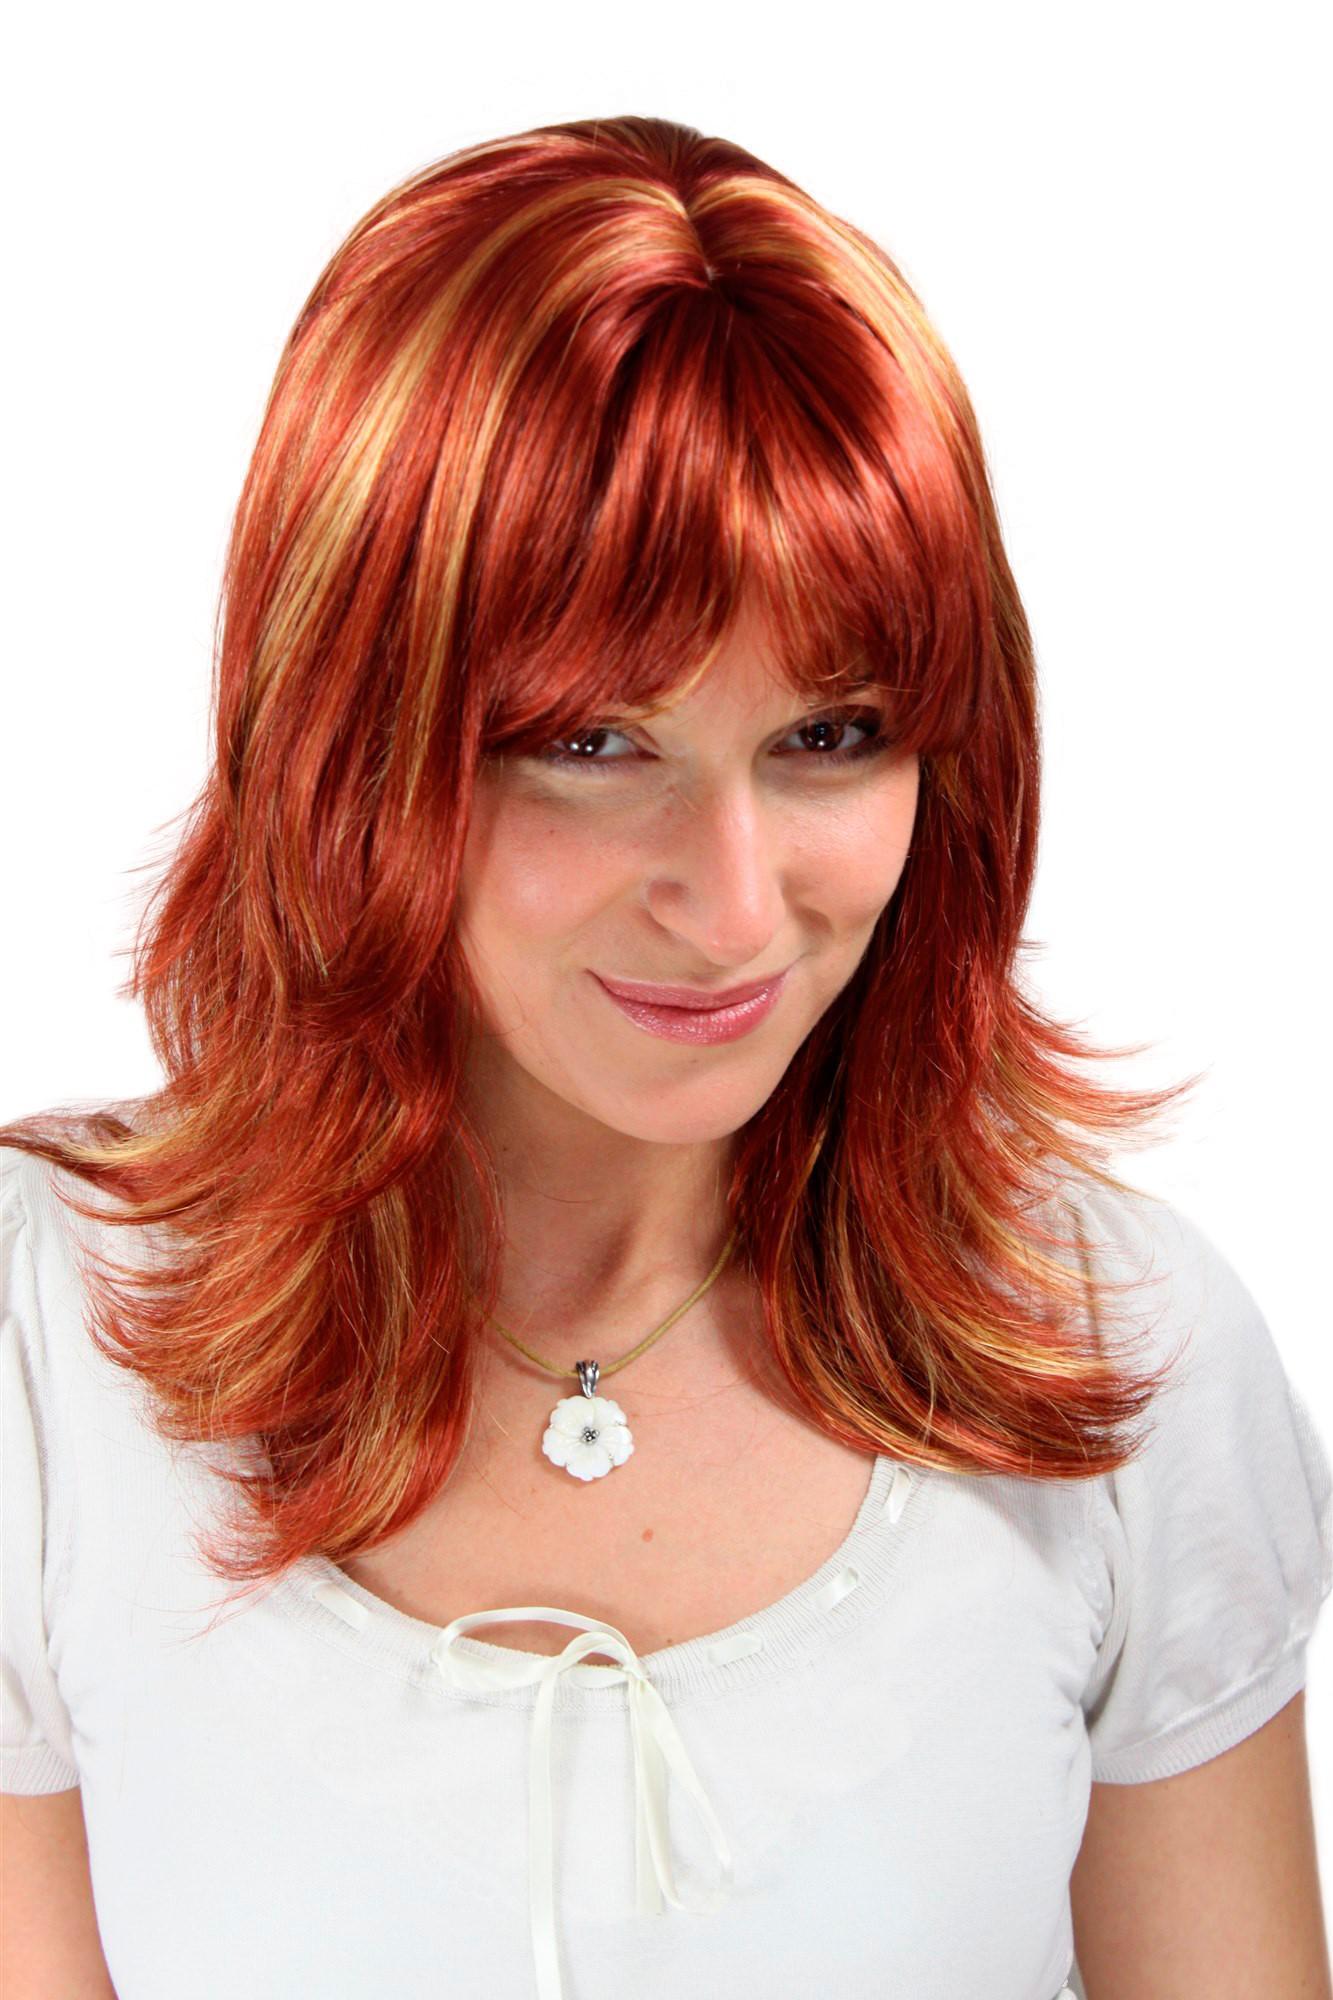 Damen Perücke Wig ATEMBERAUBEND Rot/Blond Wild GESTRÄHNT